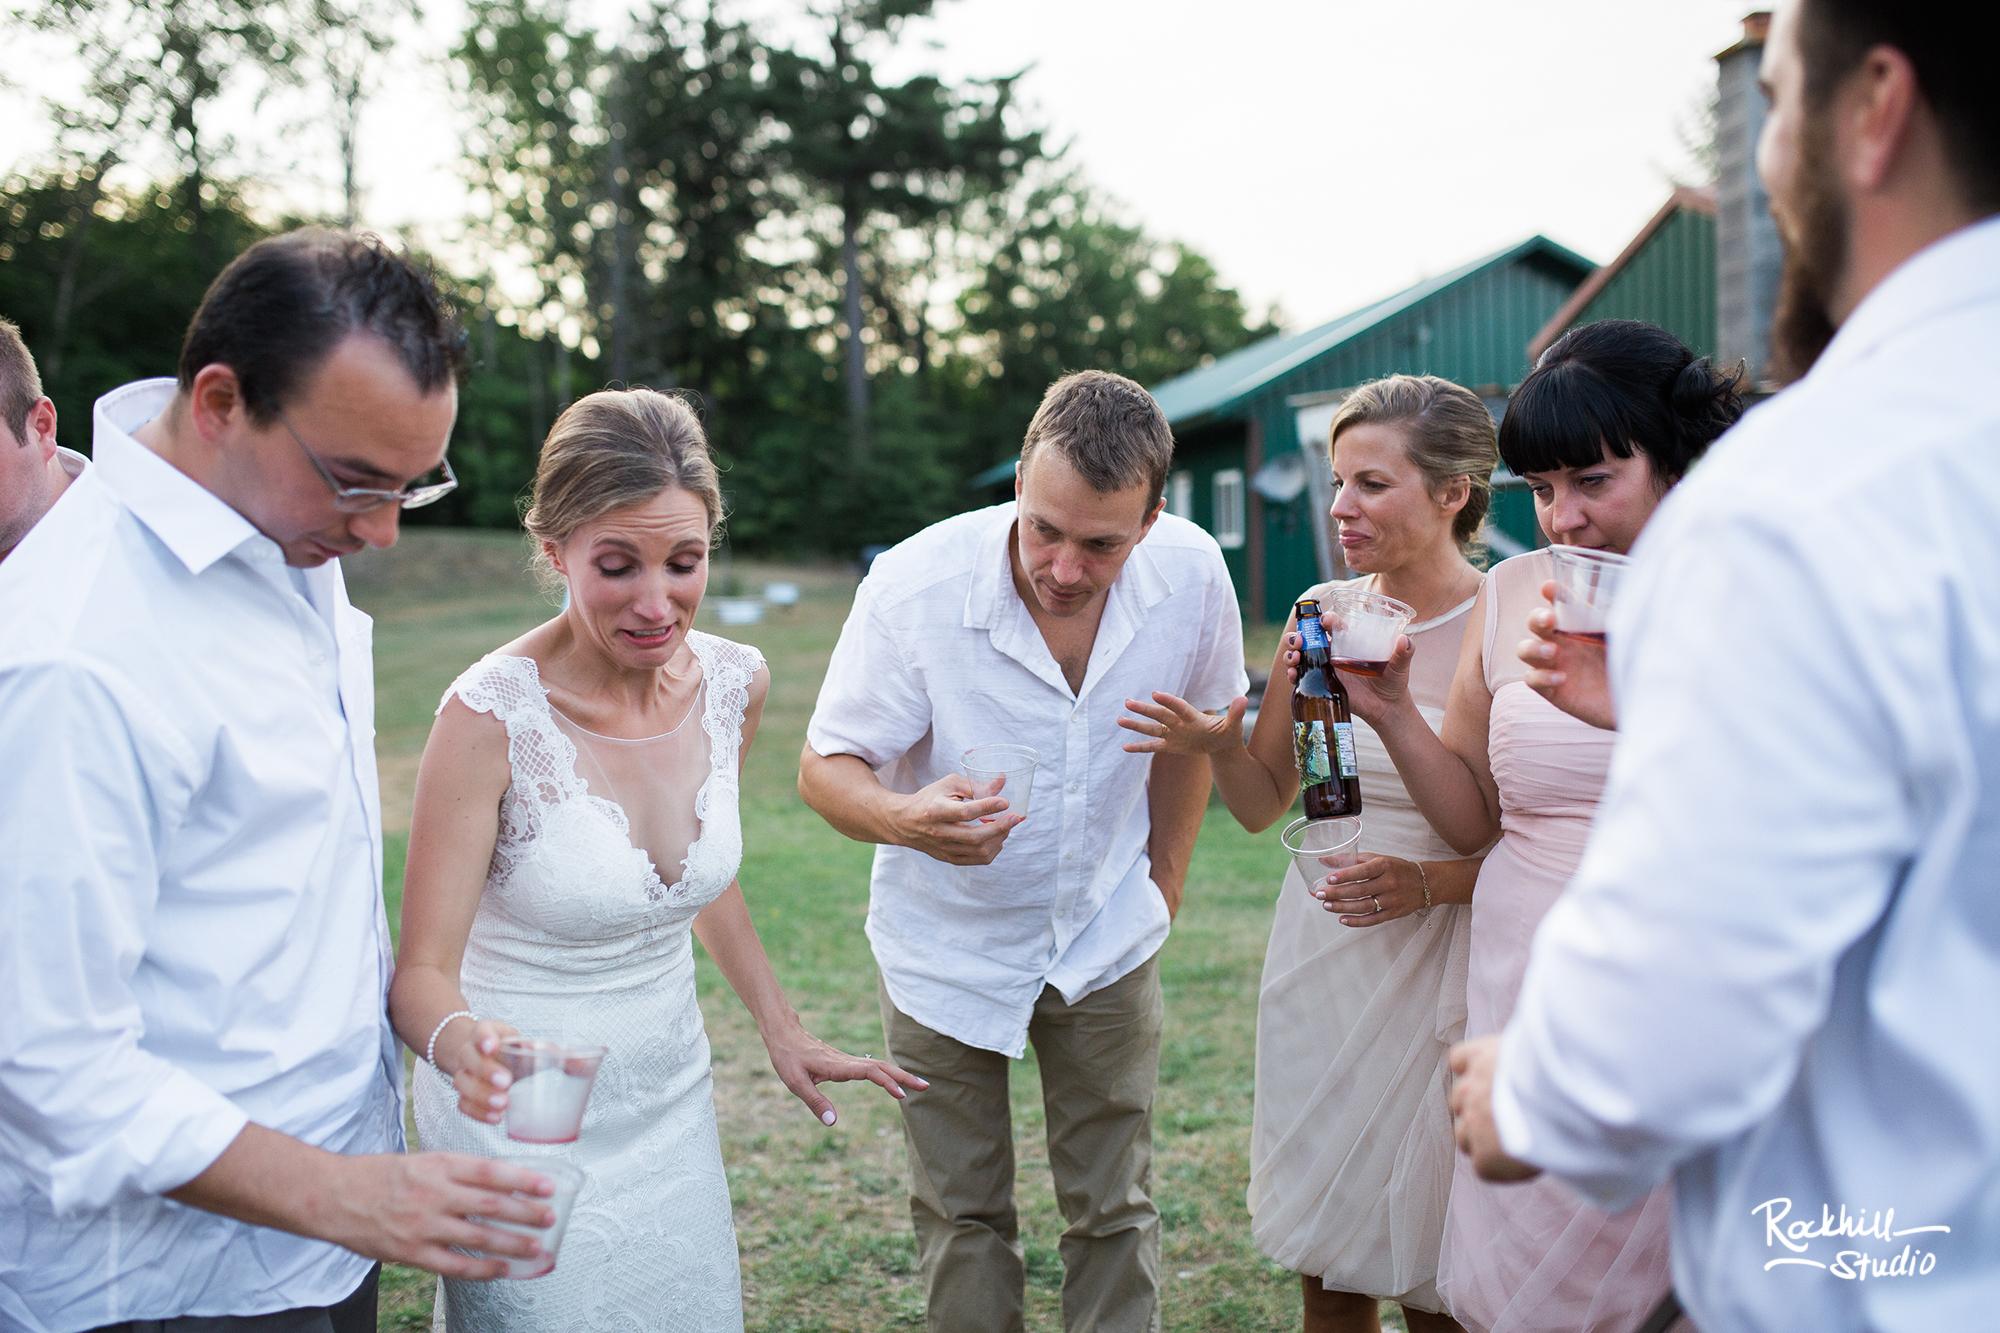 grand-marais-wedding-photography-upper-peninsula-northern-michigan-rockhill-98.jpg